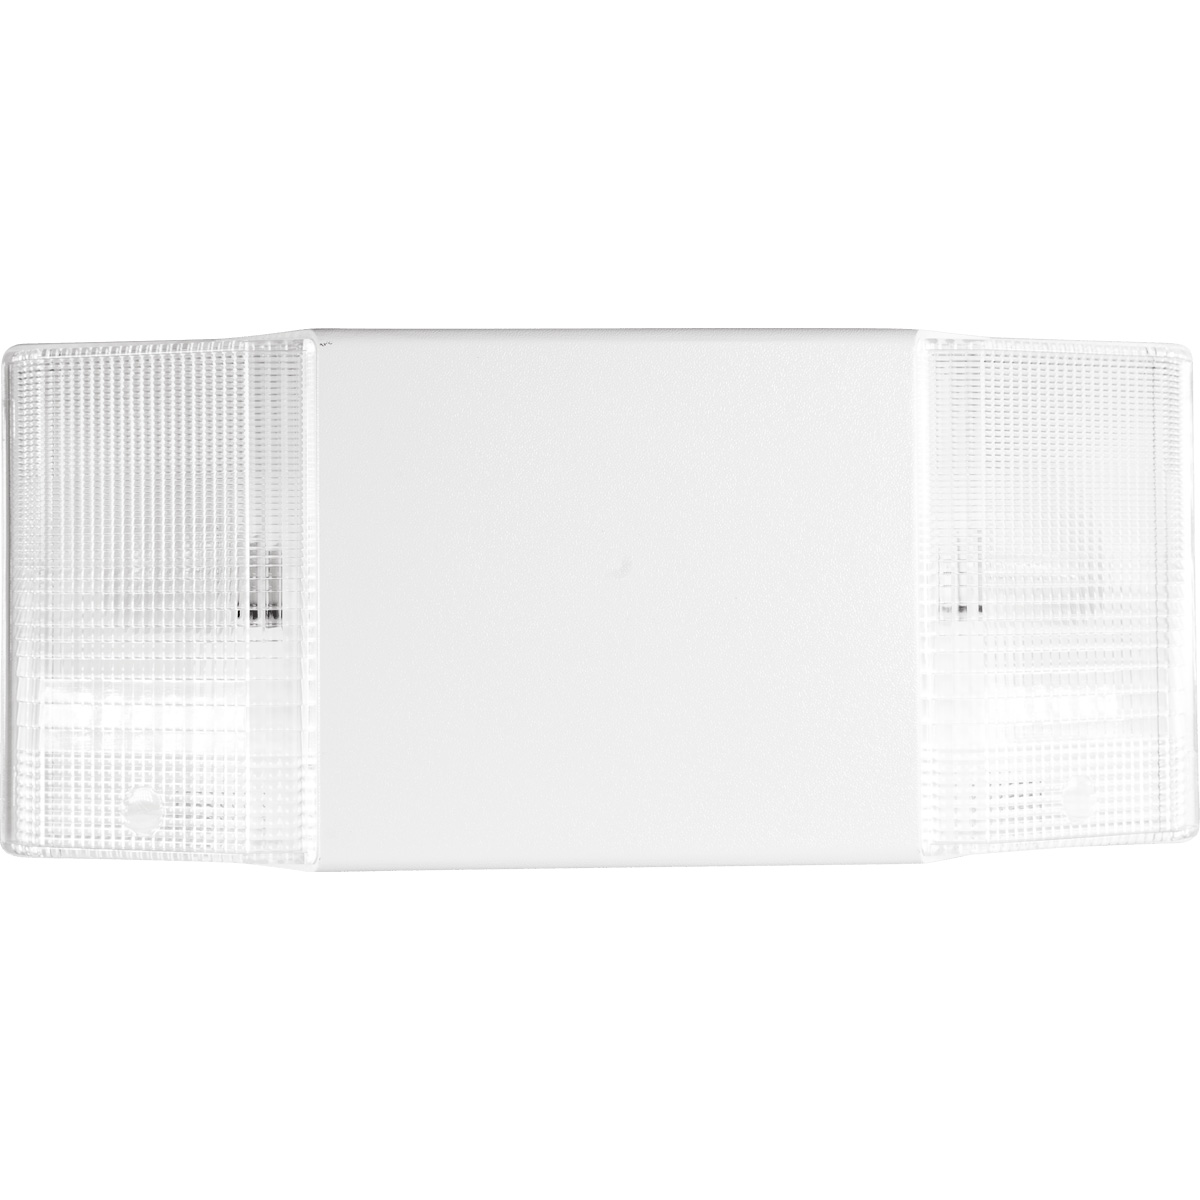 Fixed-Optics Incandescent Emergency Light Series : ELR2